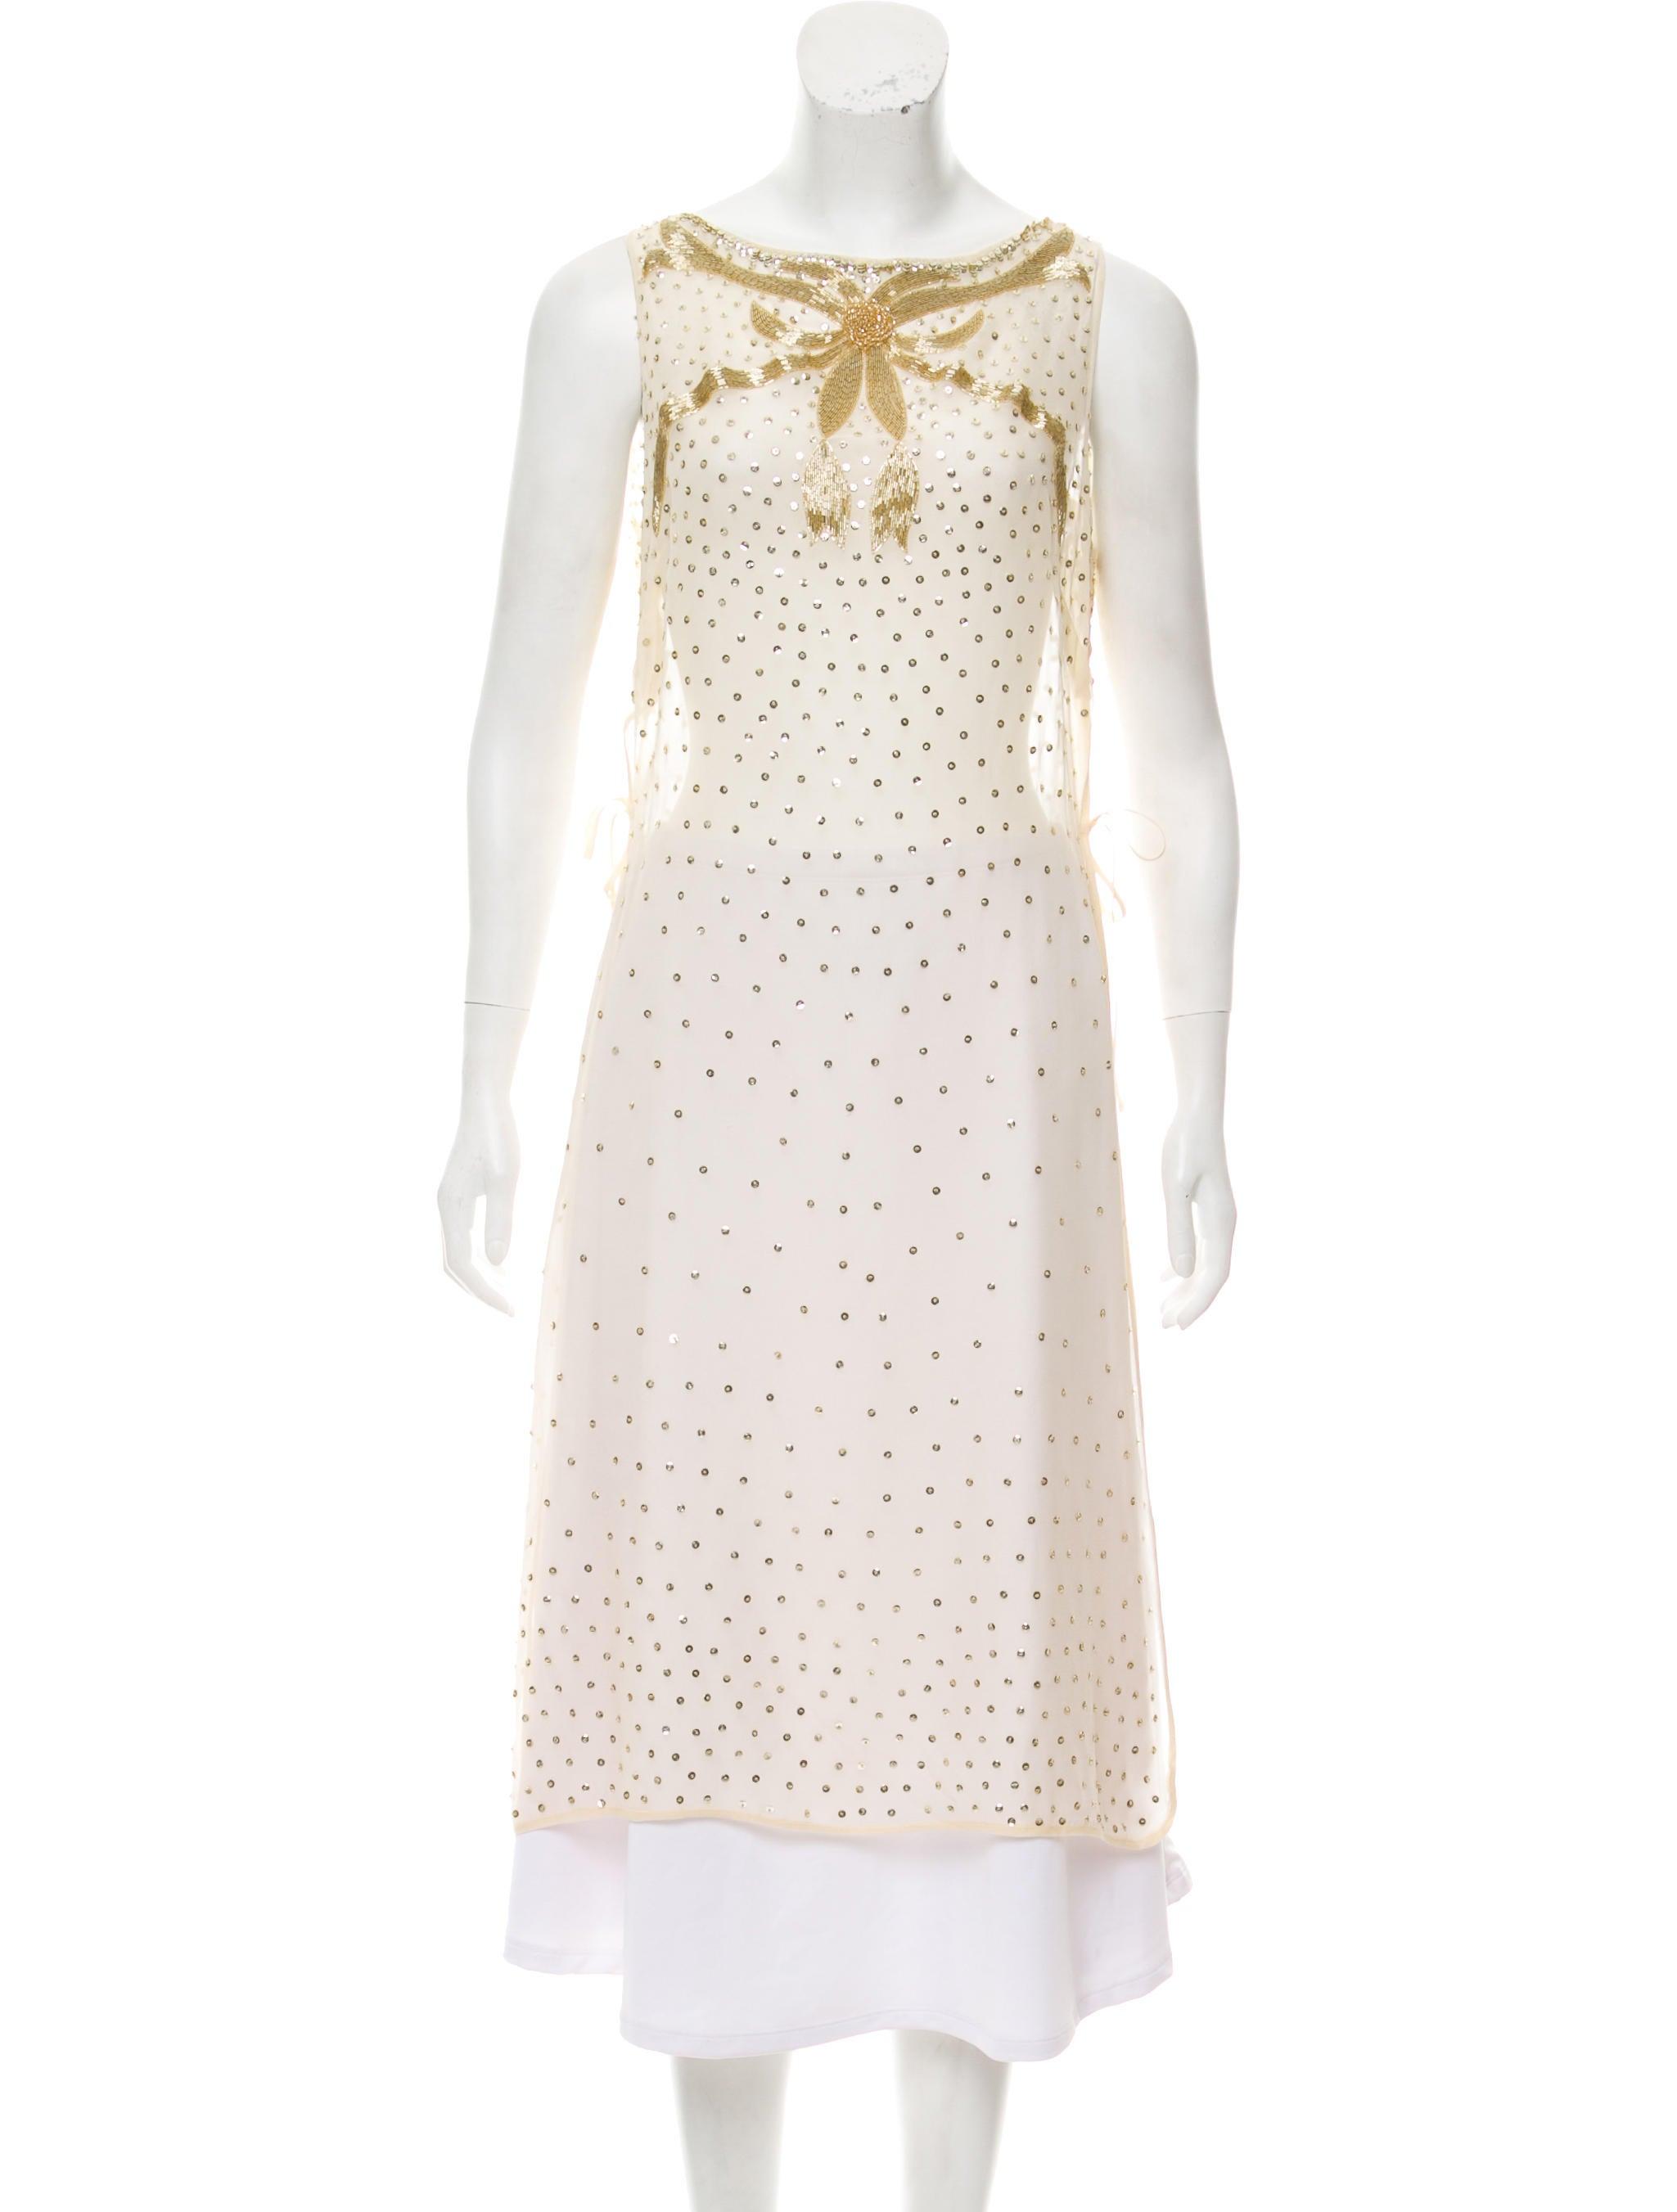 L'Wren Scott Sequin Embellished Sleeveless Tunic Cheap Best Buy Cheap Eastbay huSbRBTJny